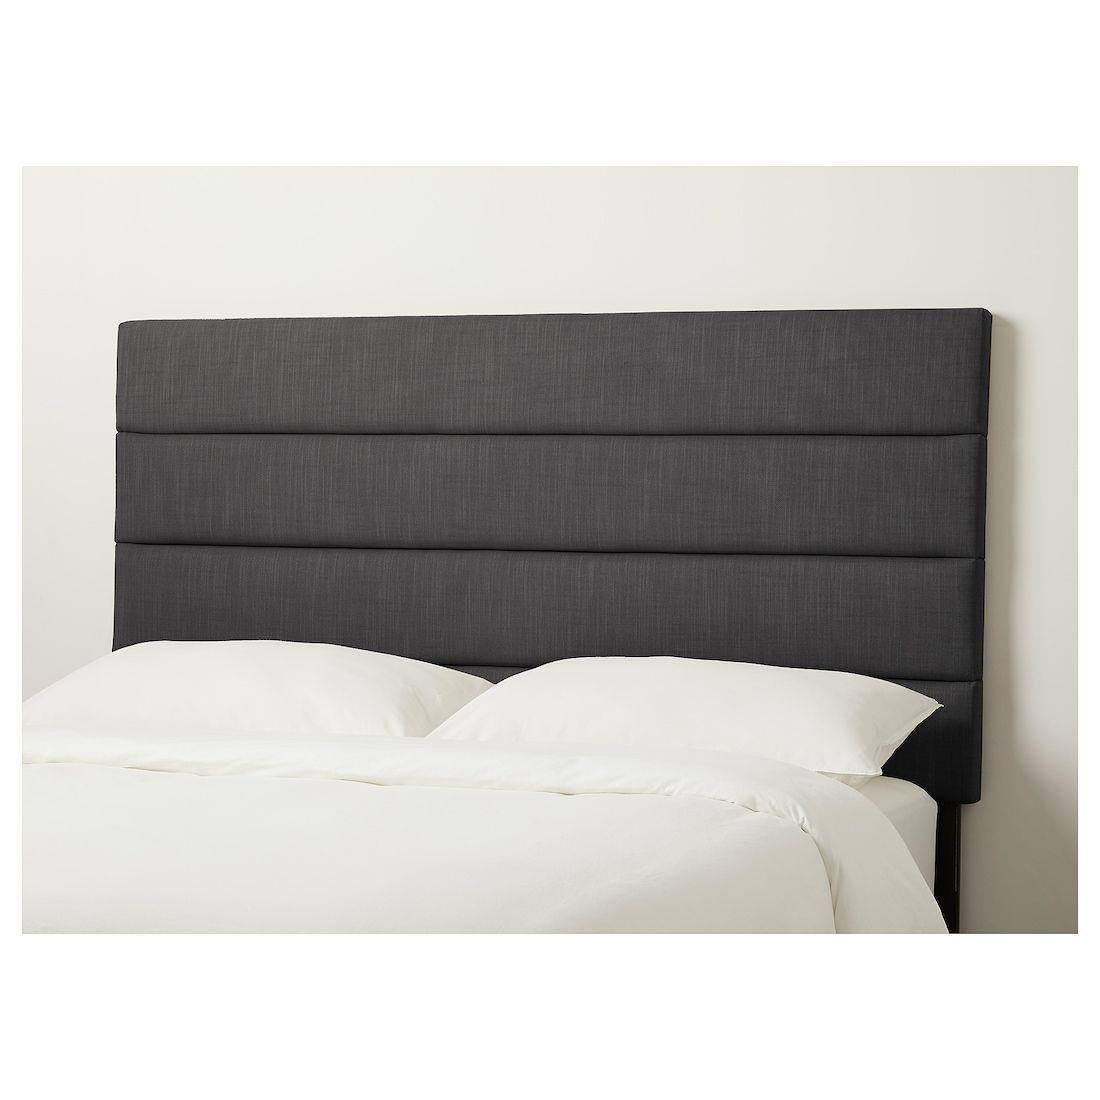 Ikea Eidsberg Headboard In 2020 Grey Headboard Bed Rustic